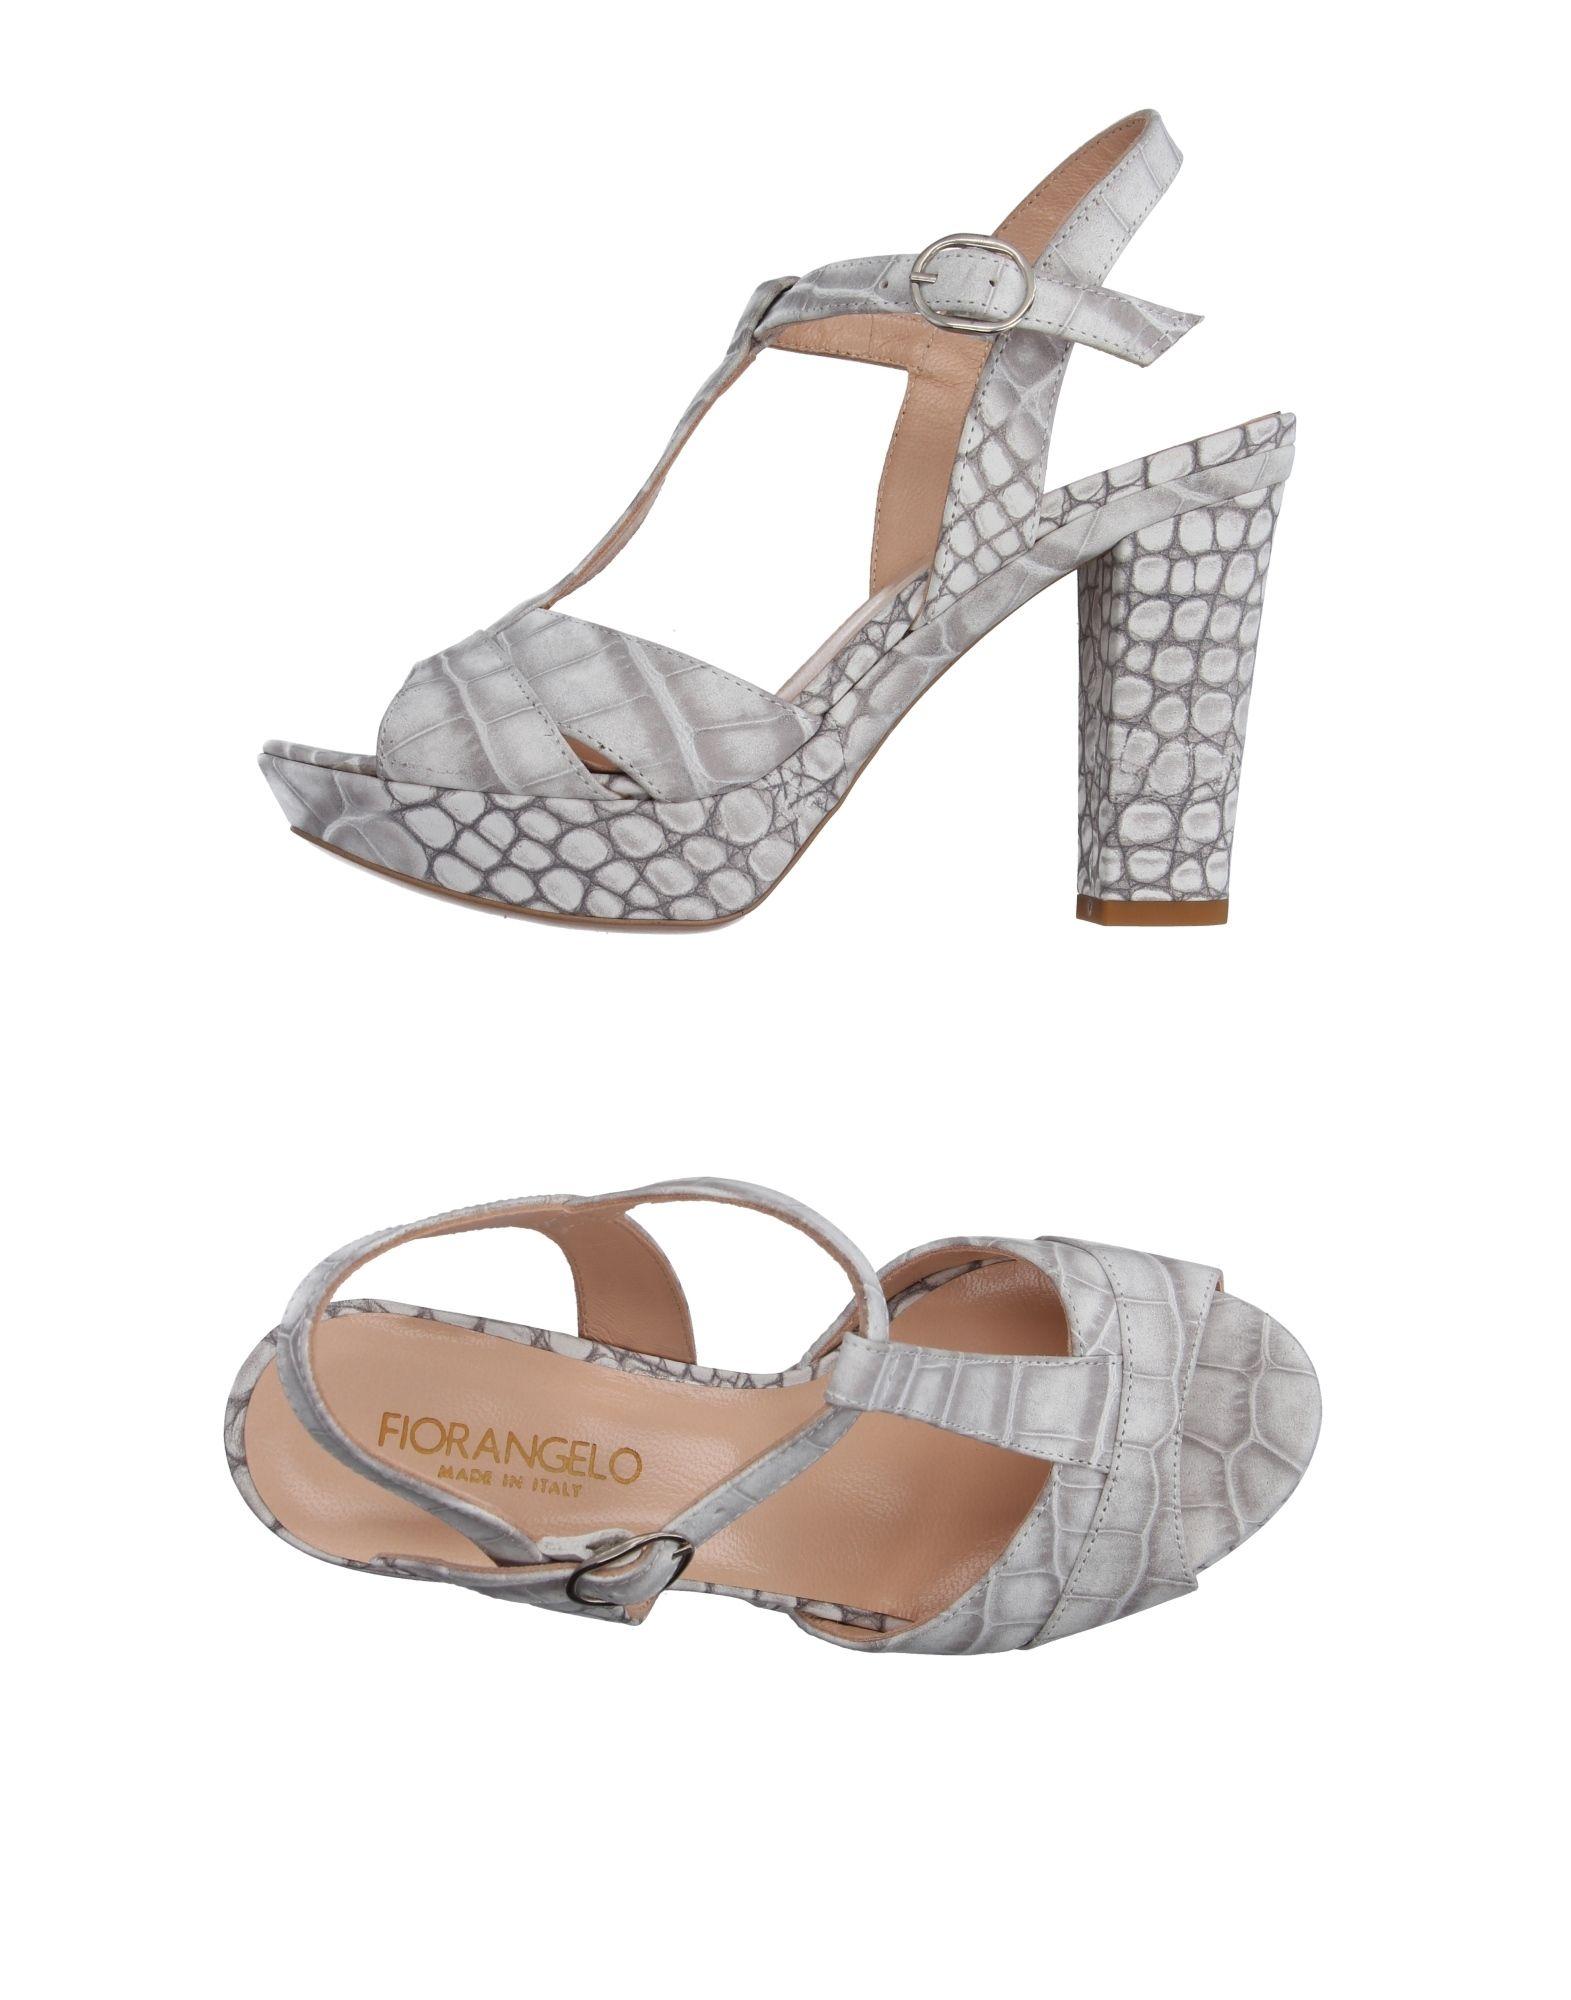 Fiorangelo Sandalen Damen  11123194UX Gute Qualität beliebte Schuhe